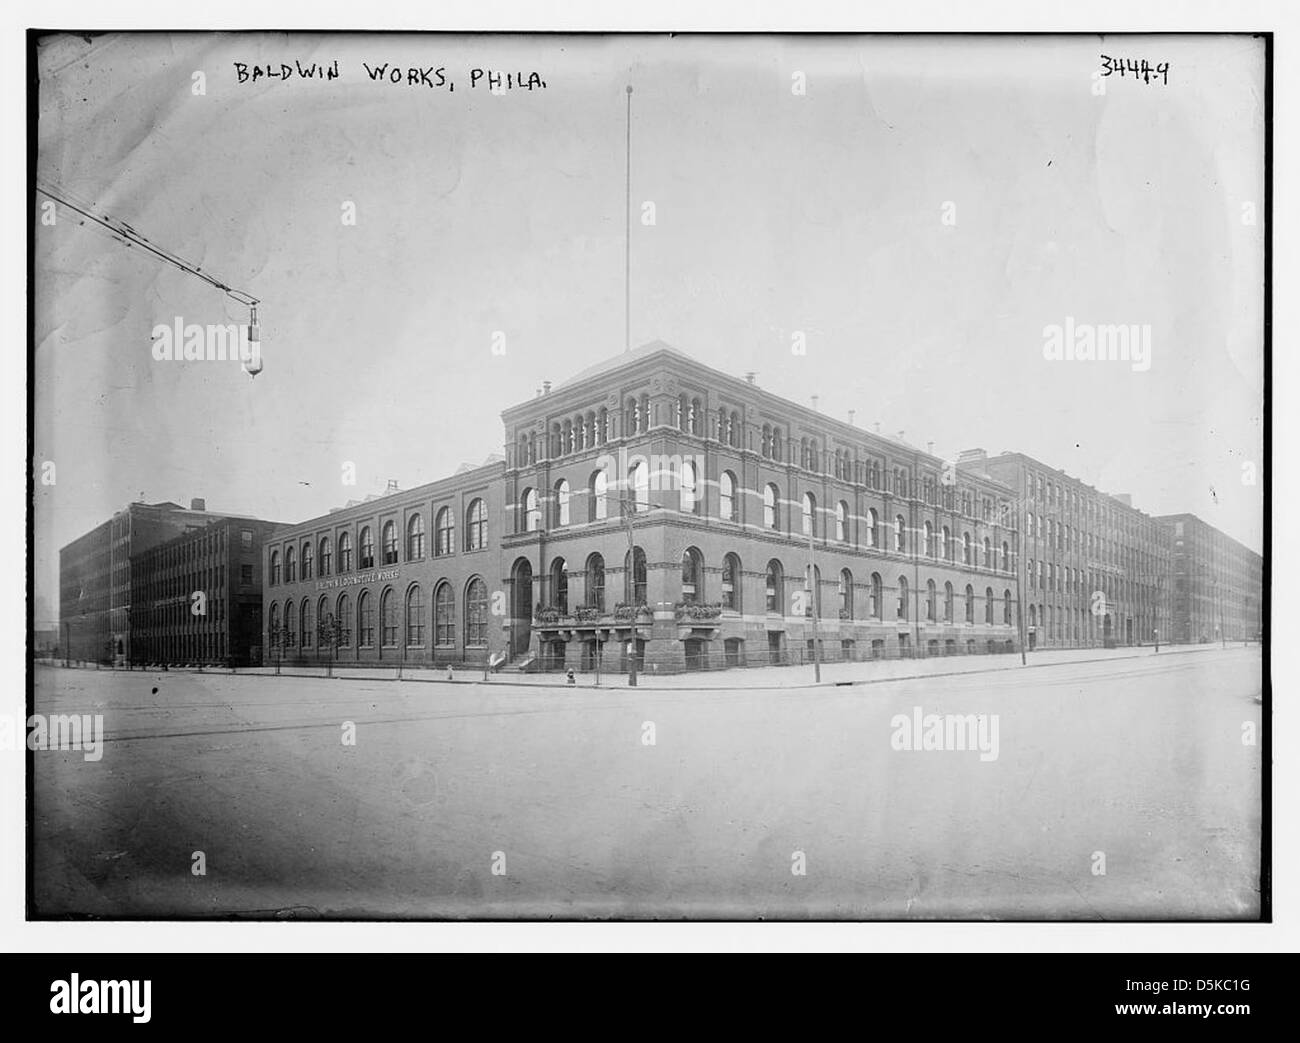 Baldwin Works, Phila. (LOC) - Stock Image